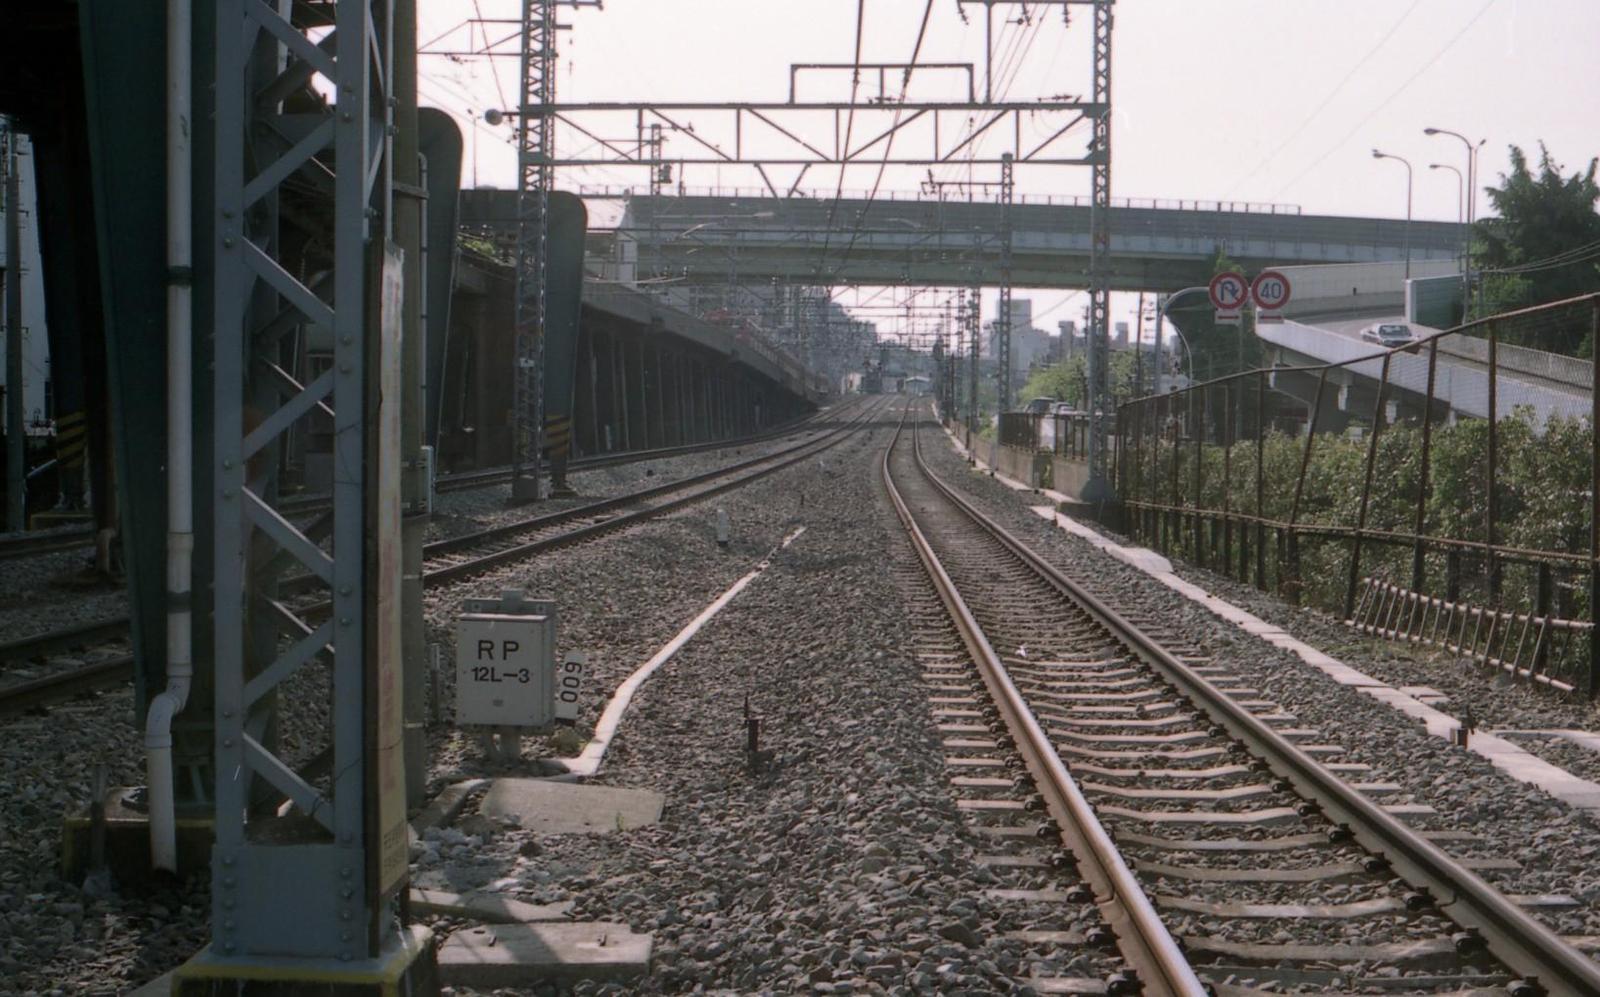 19920510d10